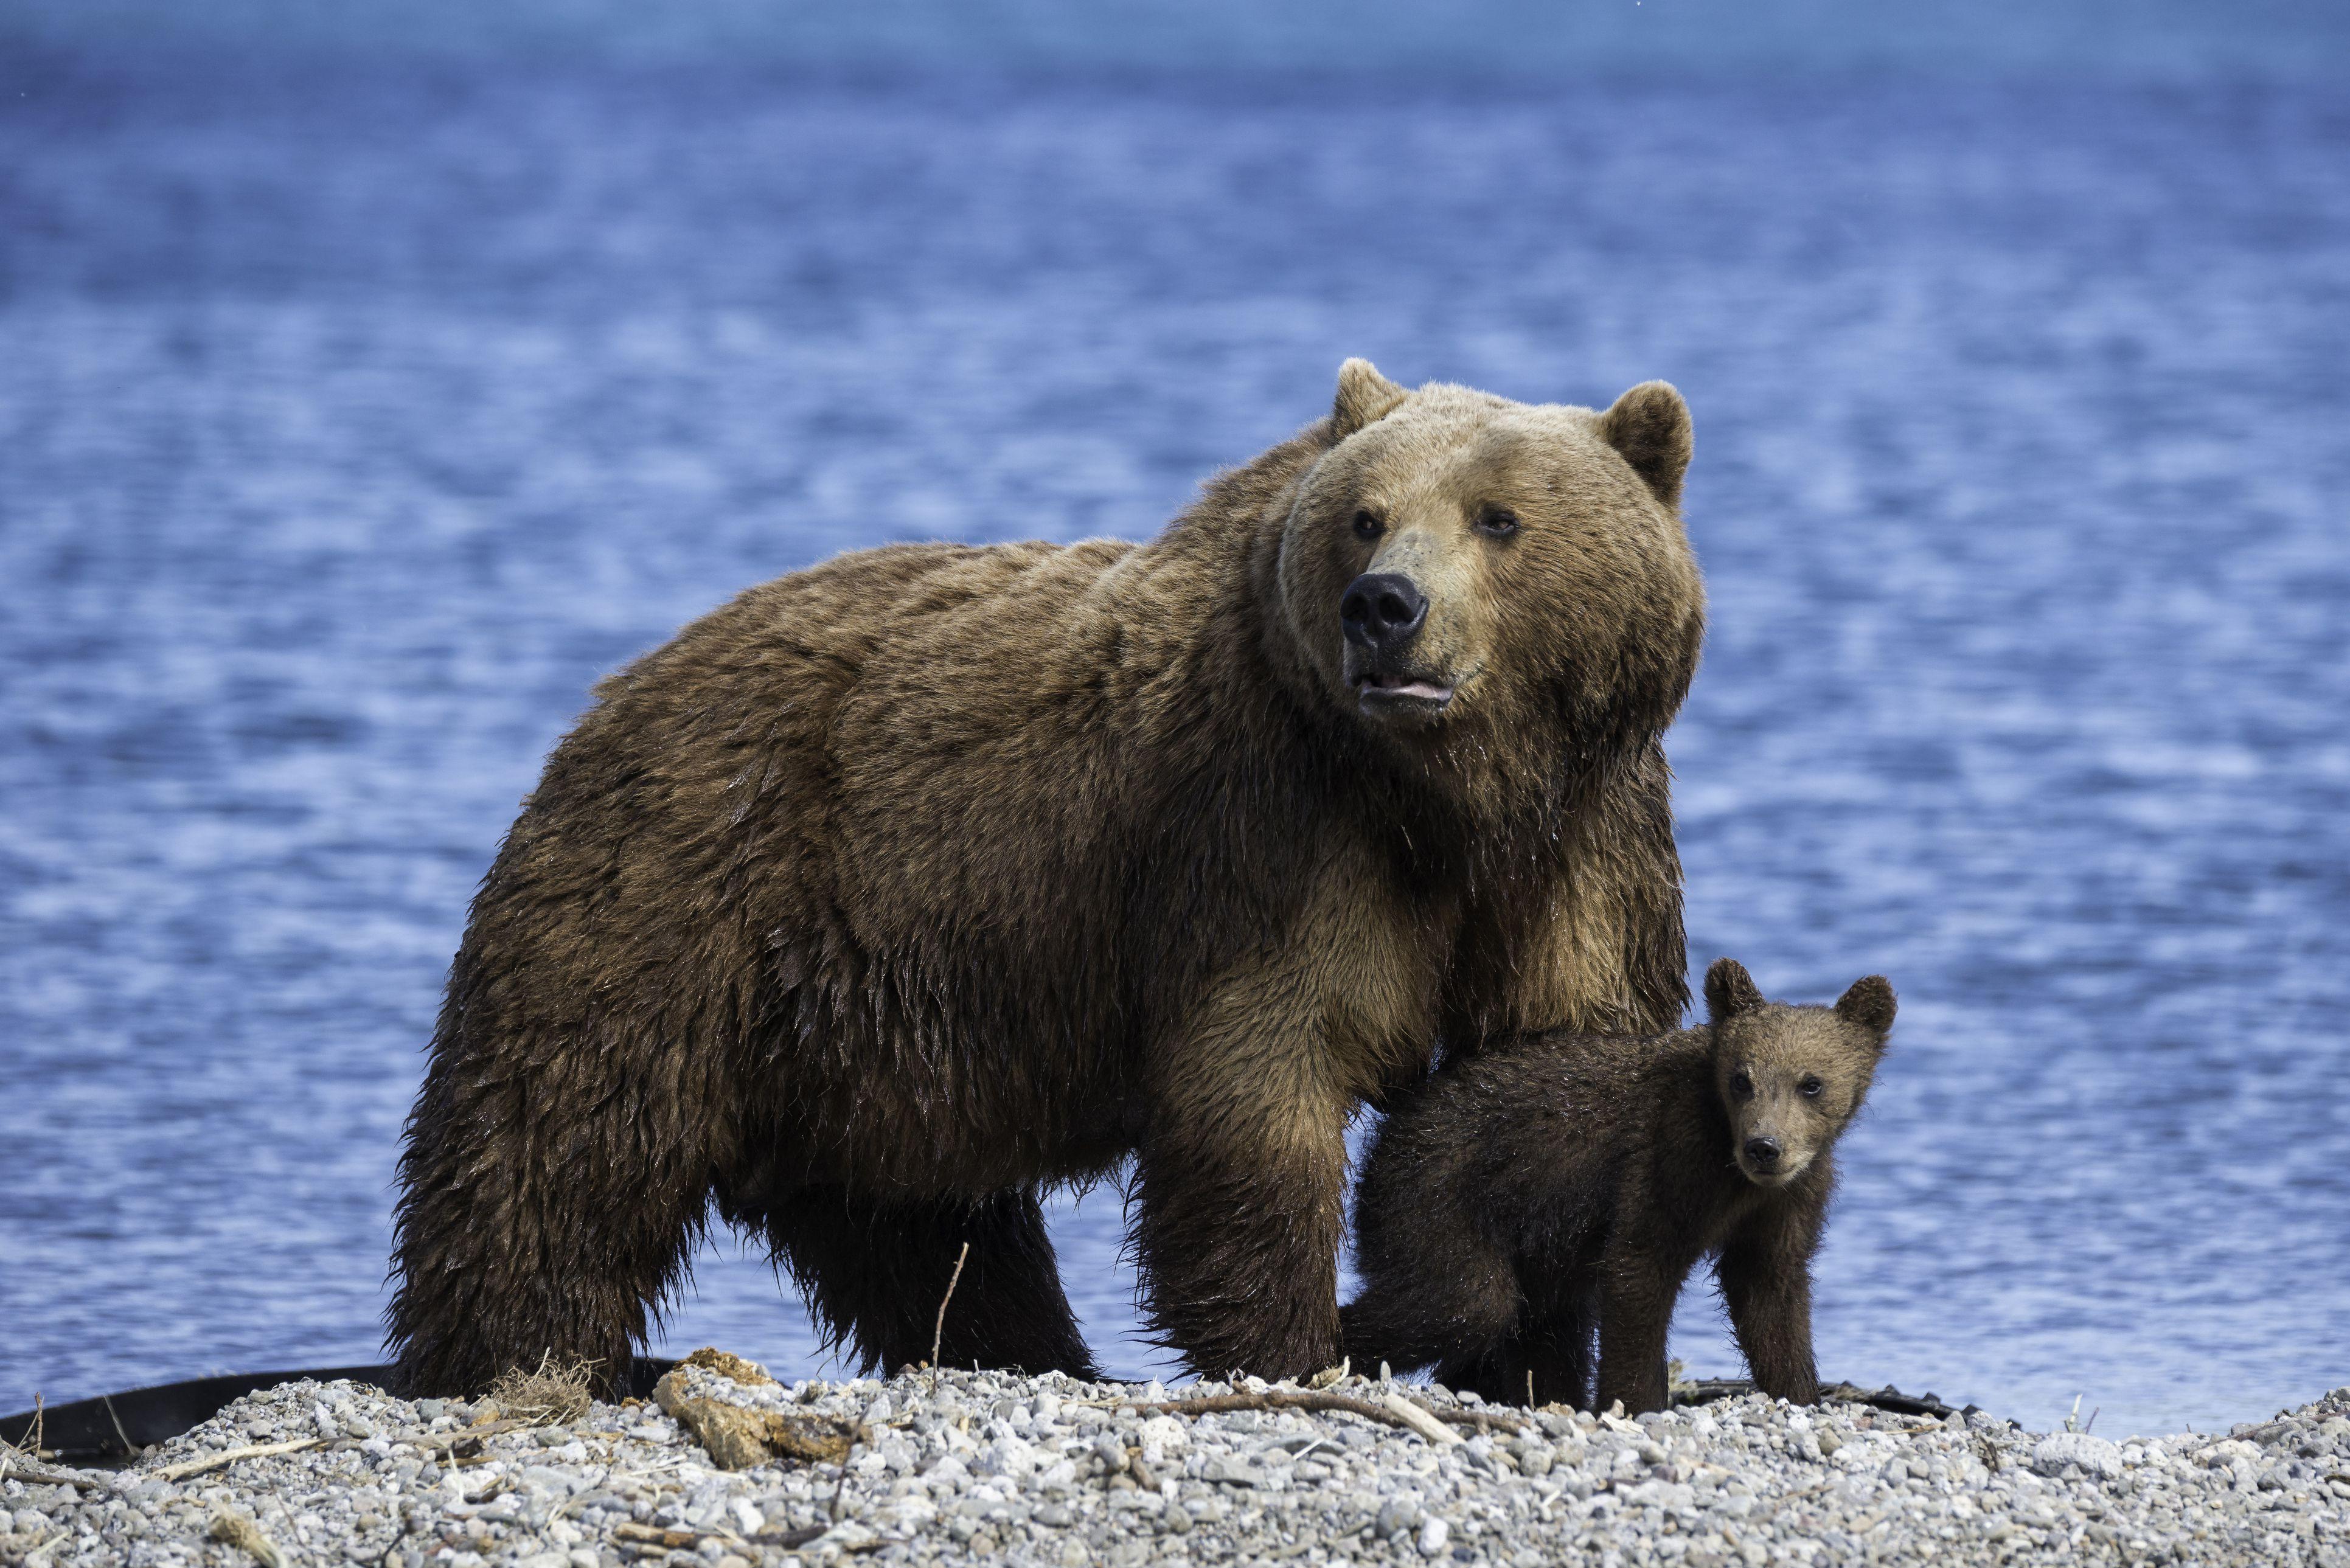 Brown Bear Facts Behaviort Habitat And More